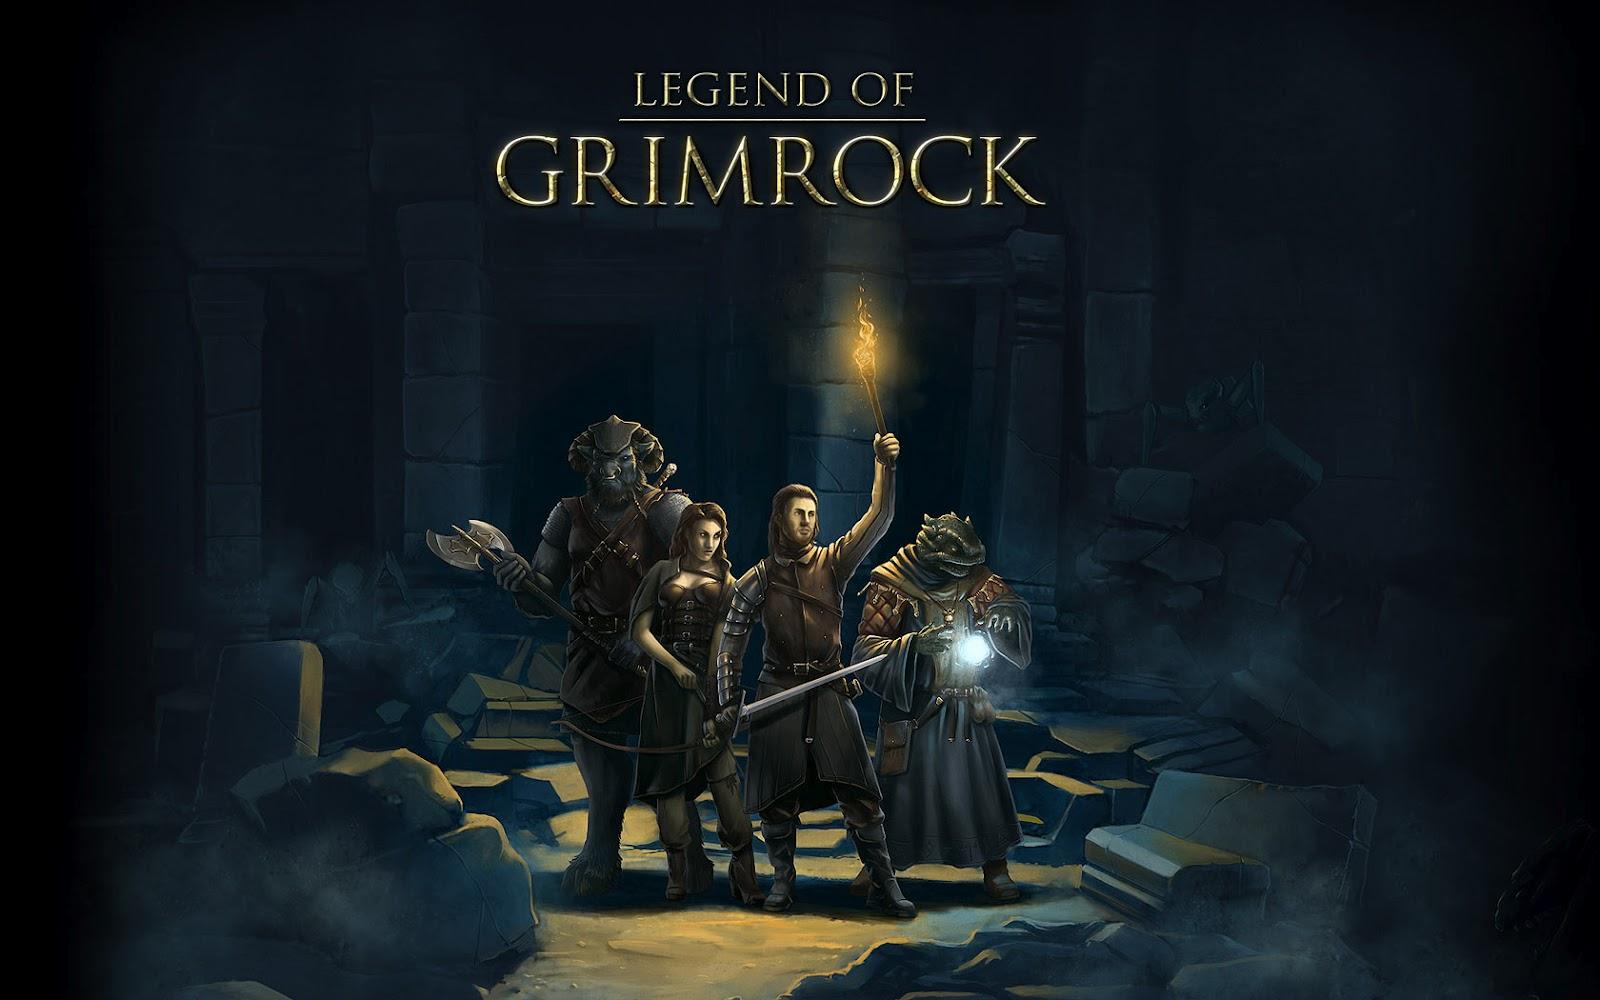 http://2.bp.blogspot.com/-Jafuhn9B8oQ/T4z84sRbuiI/AAAAAAAABRU/hG-3eoy7OPk/s1600/legend_of_grimrock_1650x1050_keyart_wallpaper.jpg